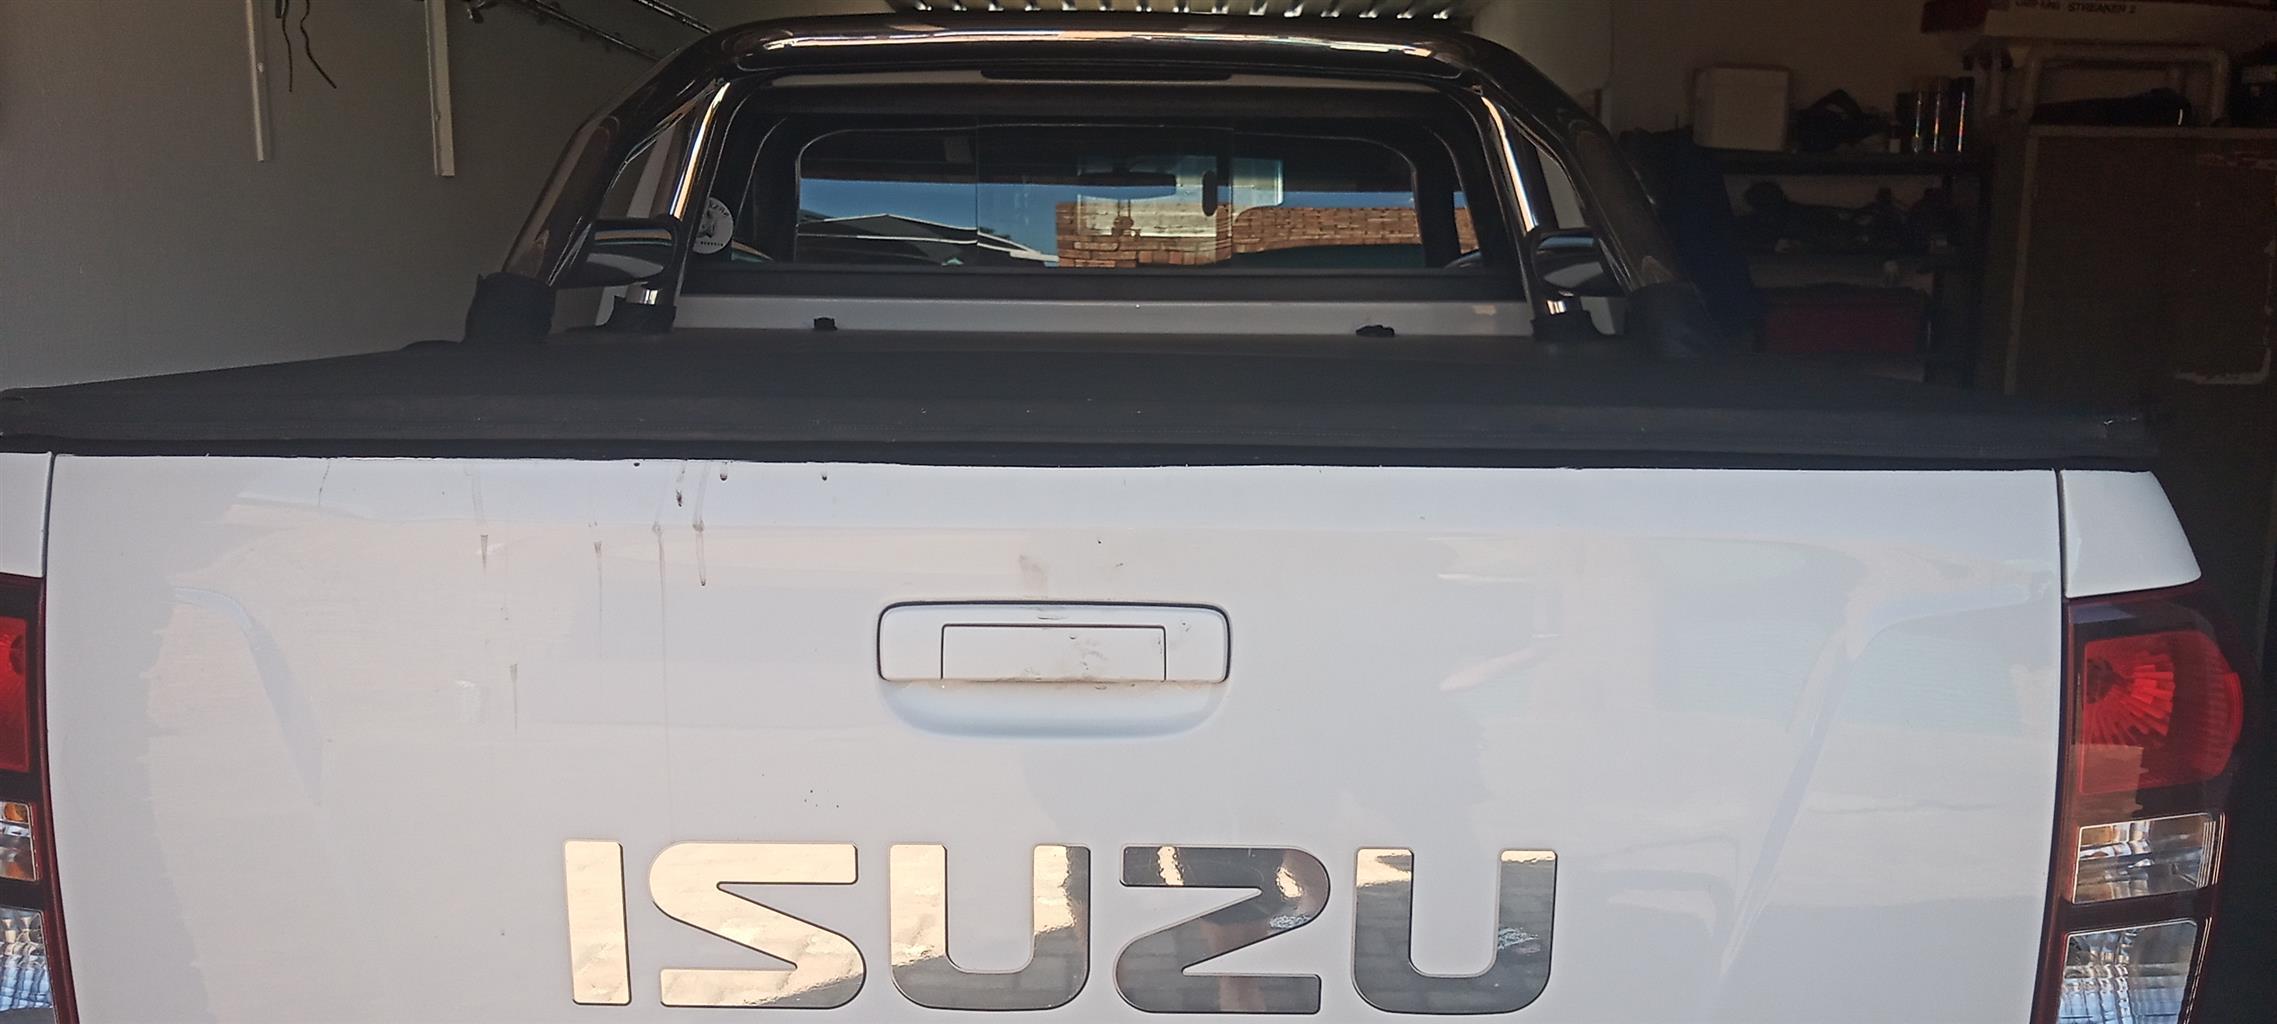 Izuzu double cab rollbar and flip cover